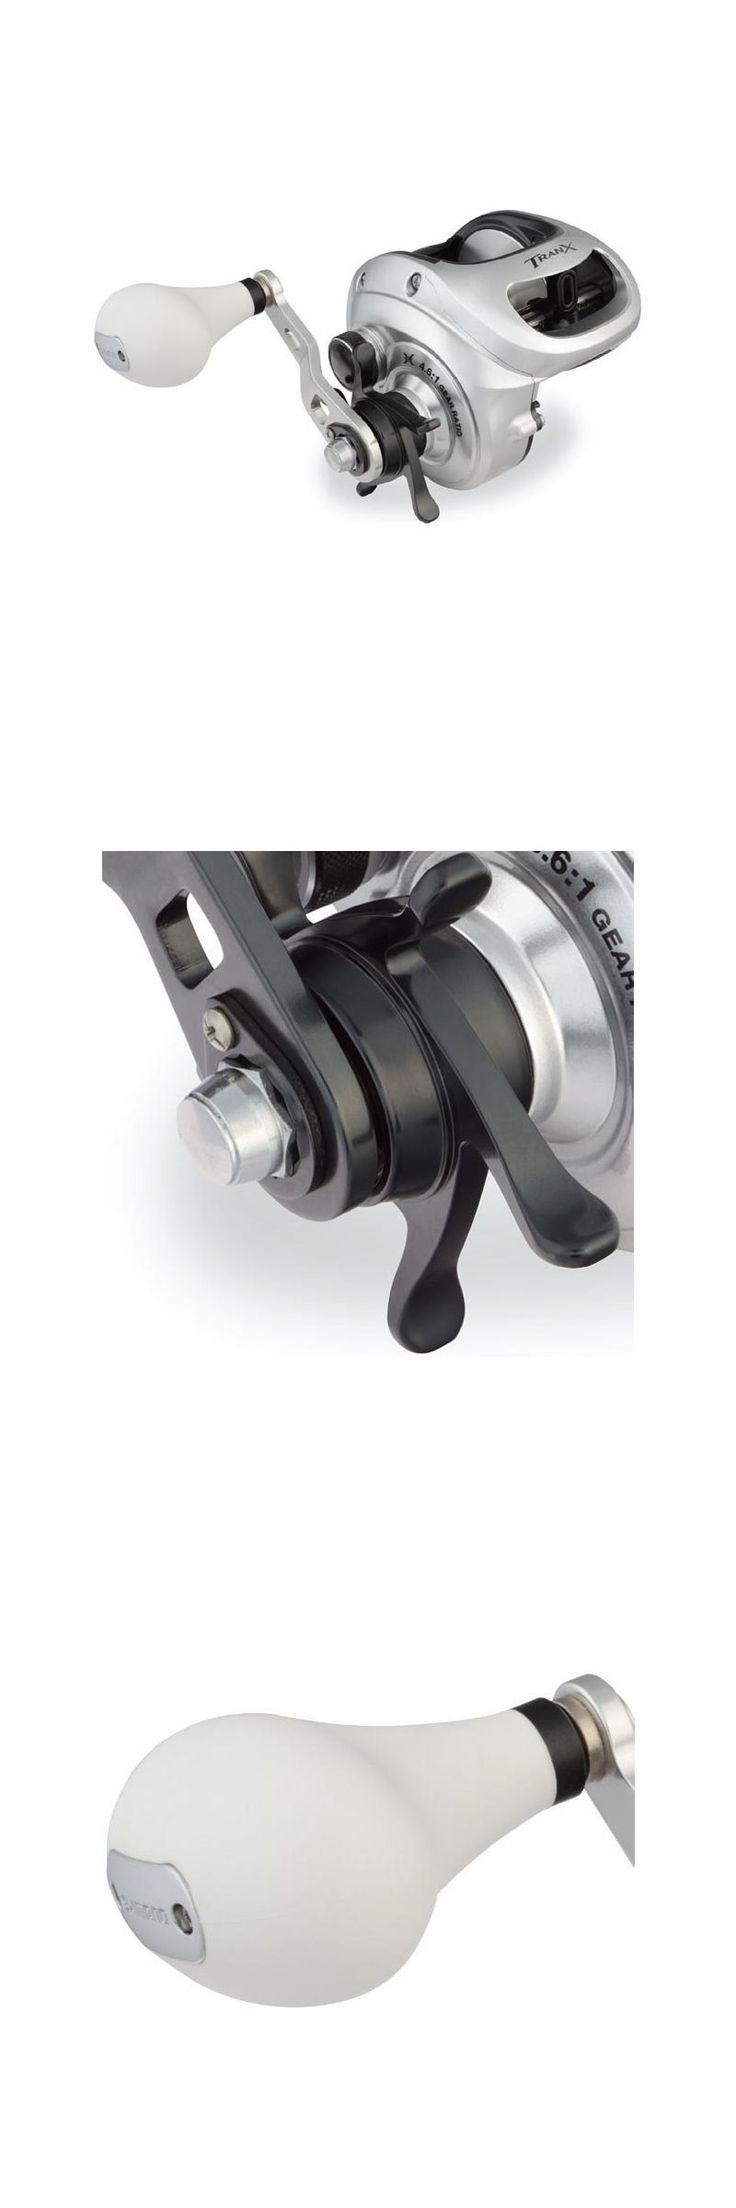 Baitcasting Reels 108153: New Shimano Reel Trx500pg - Tranx 500Pg Trx500 Pg Fishing Reel -> BUY IT NOW ONLY: $411.24 on eBay!